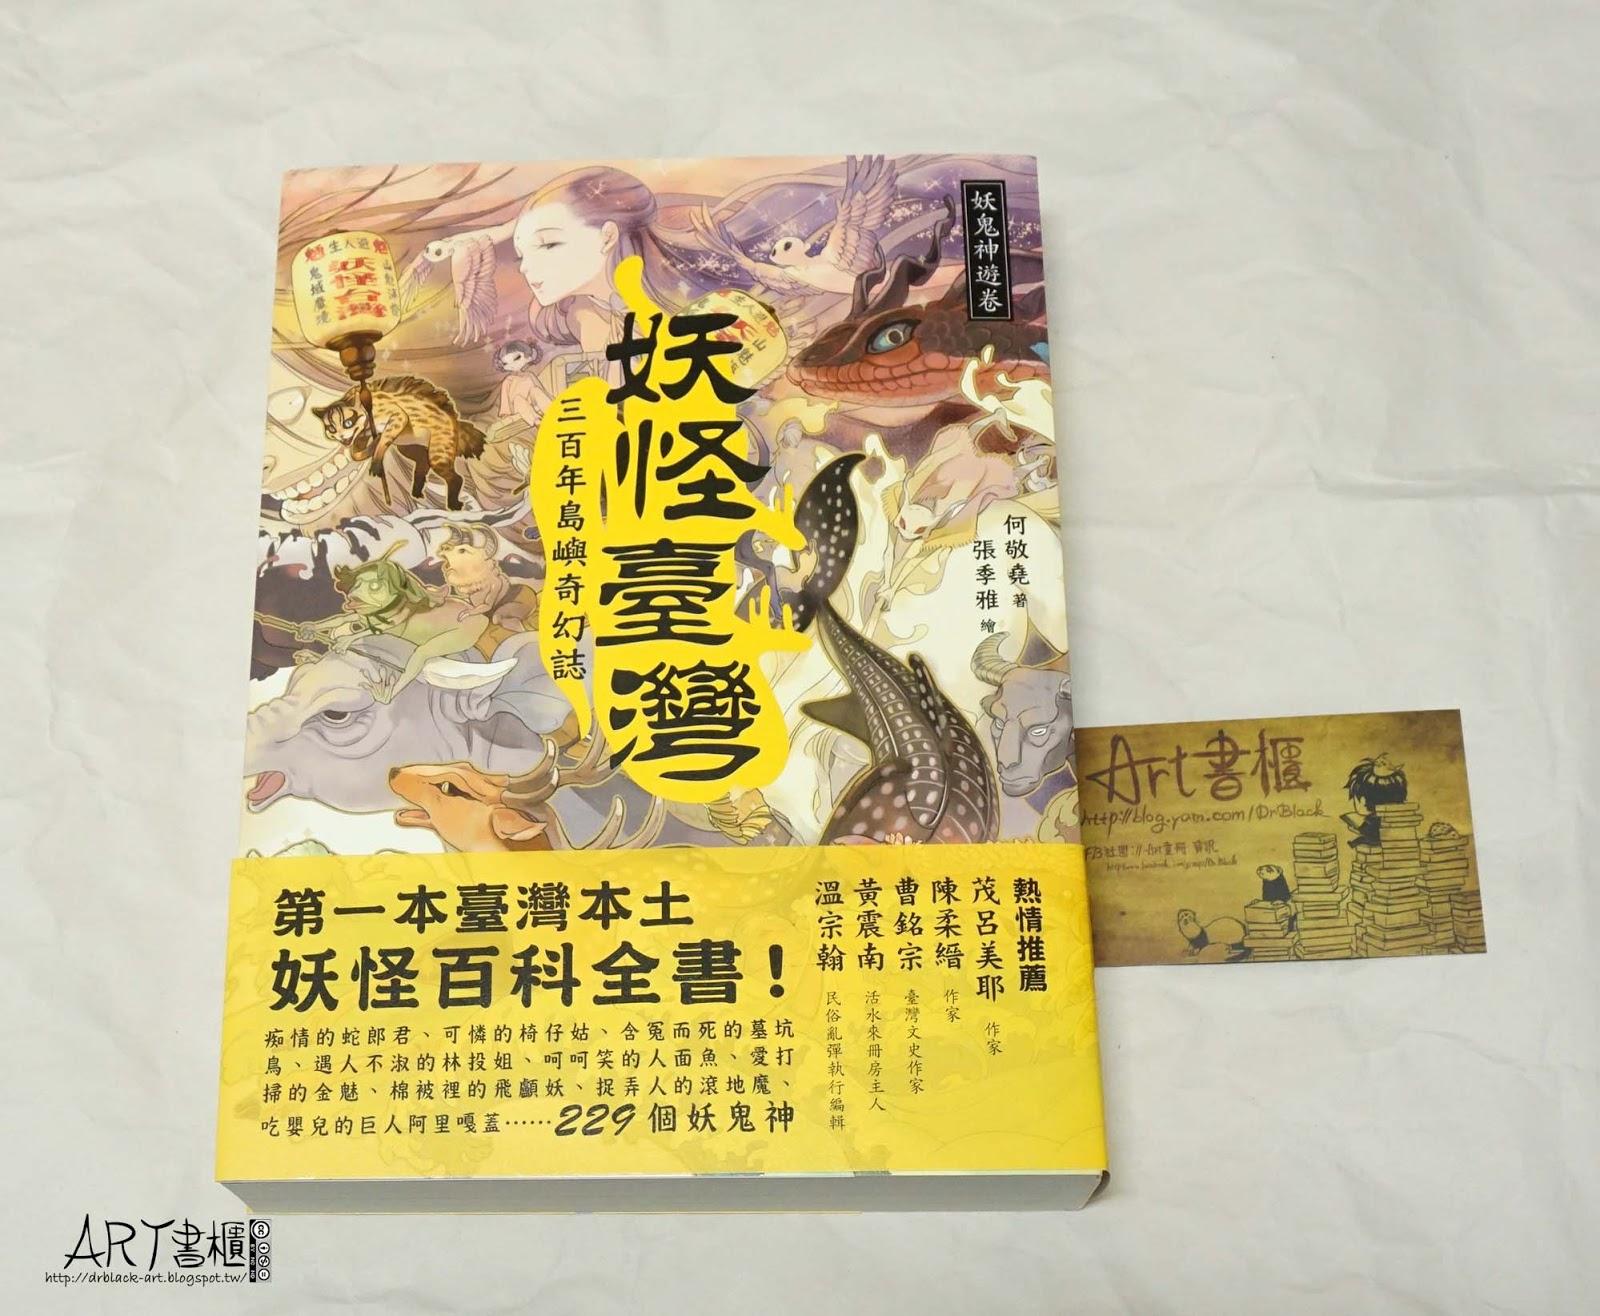 ART書櫃 Book Review: 妖怪臺灣:三百年島嶼奇幻誌‧妖鬼神遊卷